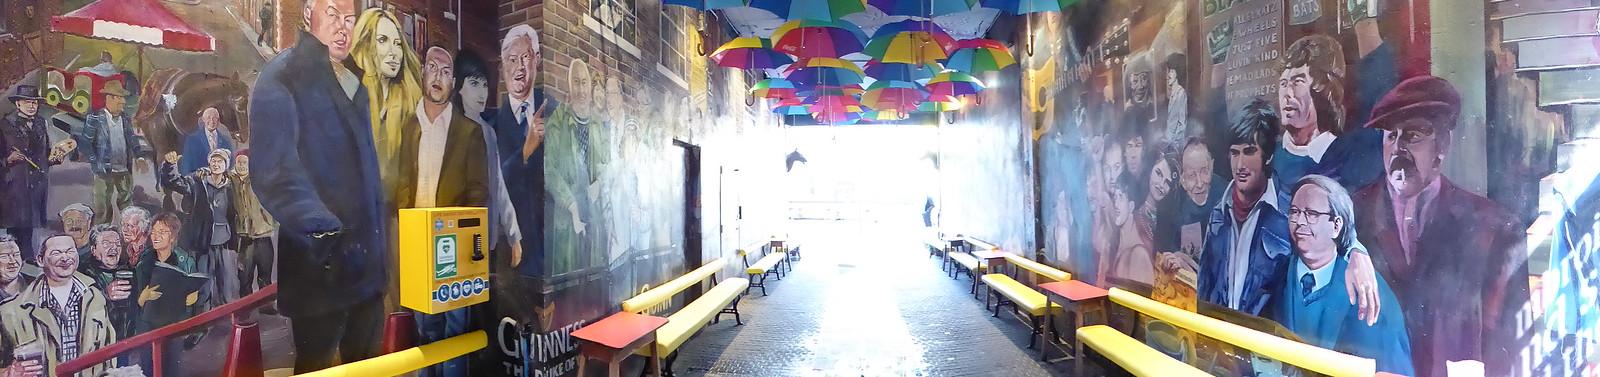 Belfast Pub garden